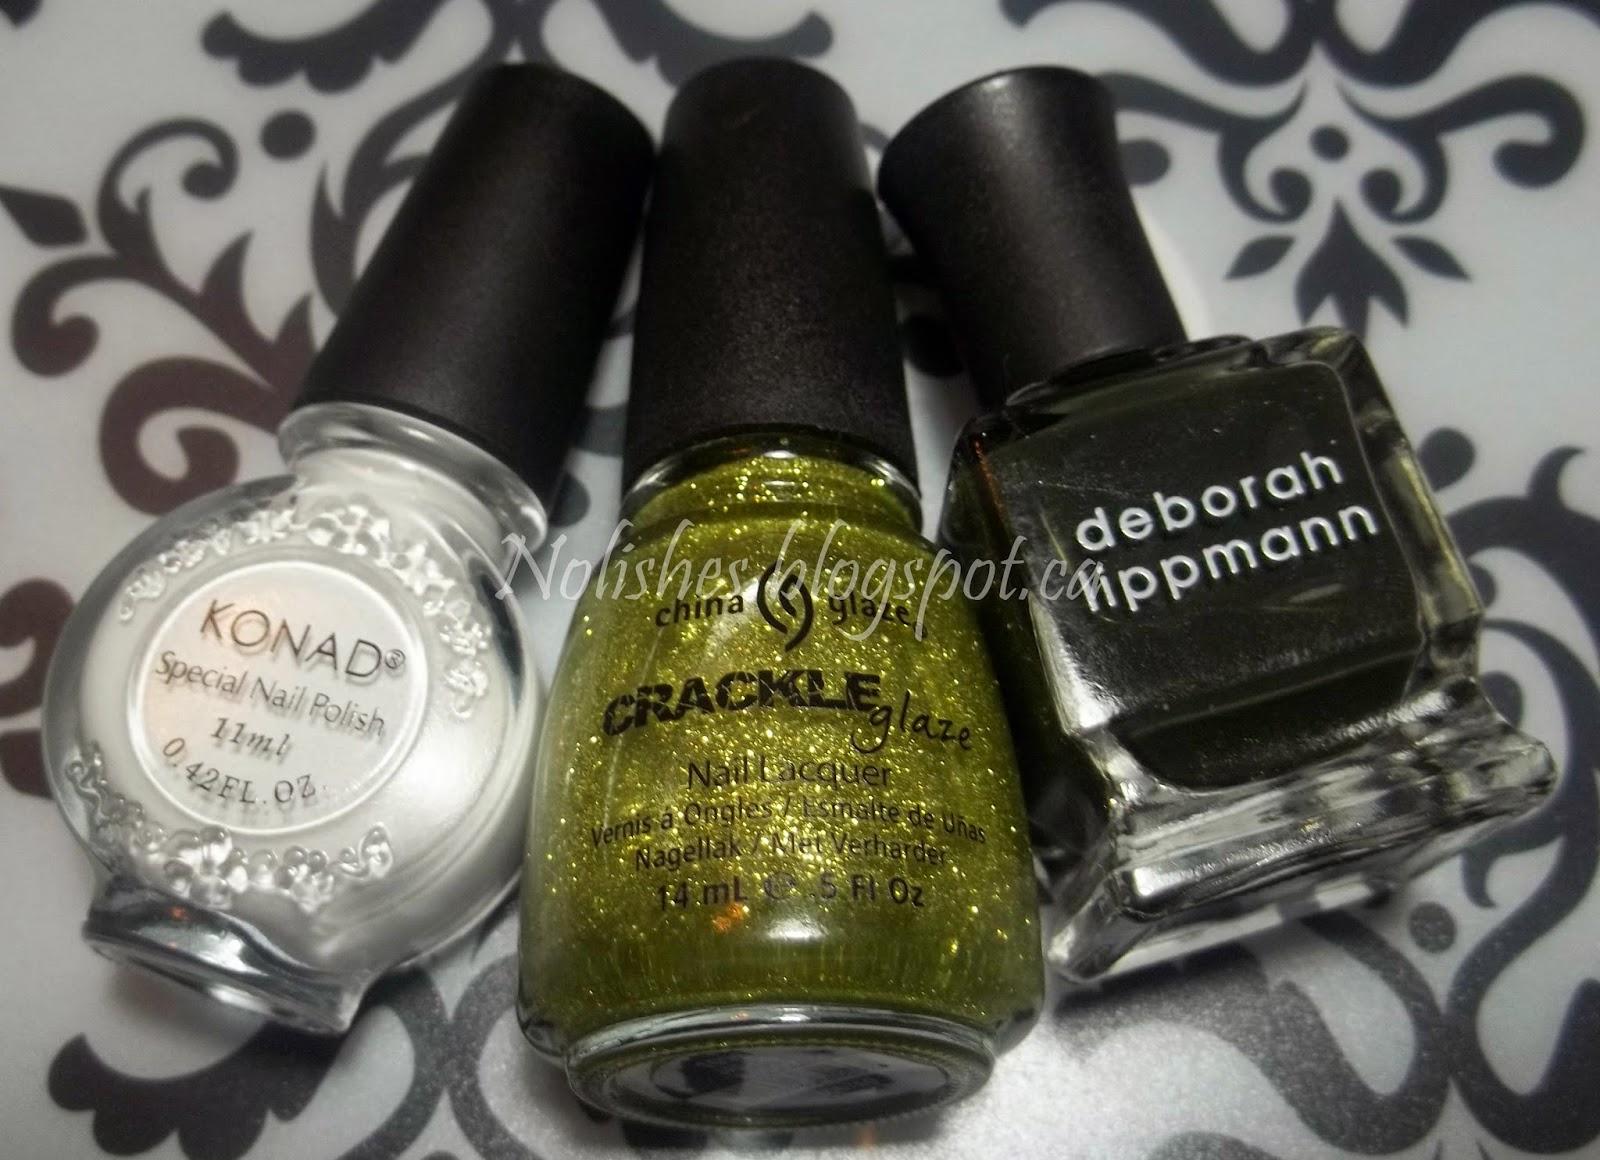 Deborah Lippmann 'Billionaire', China Glaze Crackle Glaze 'Jade-d', and Konad Special Polish in White